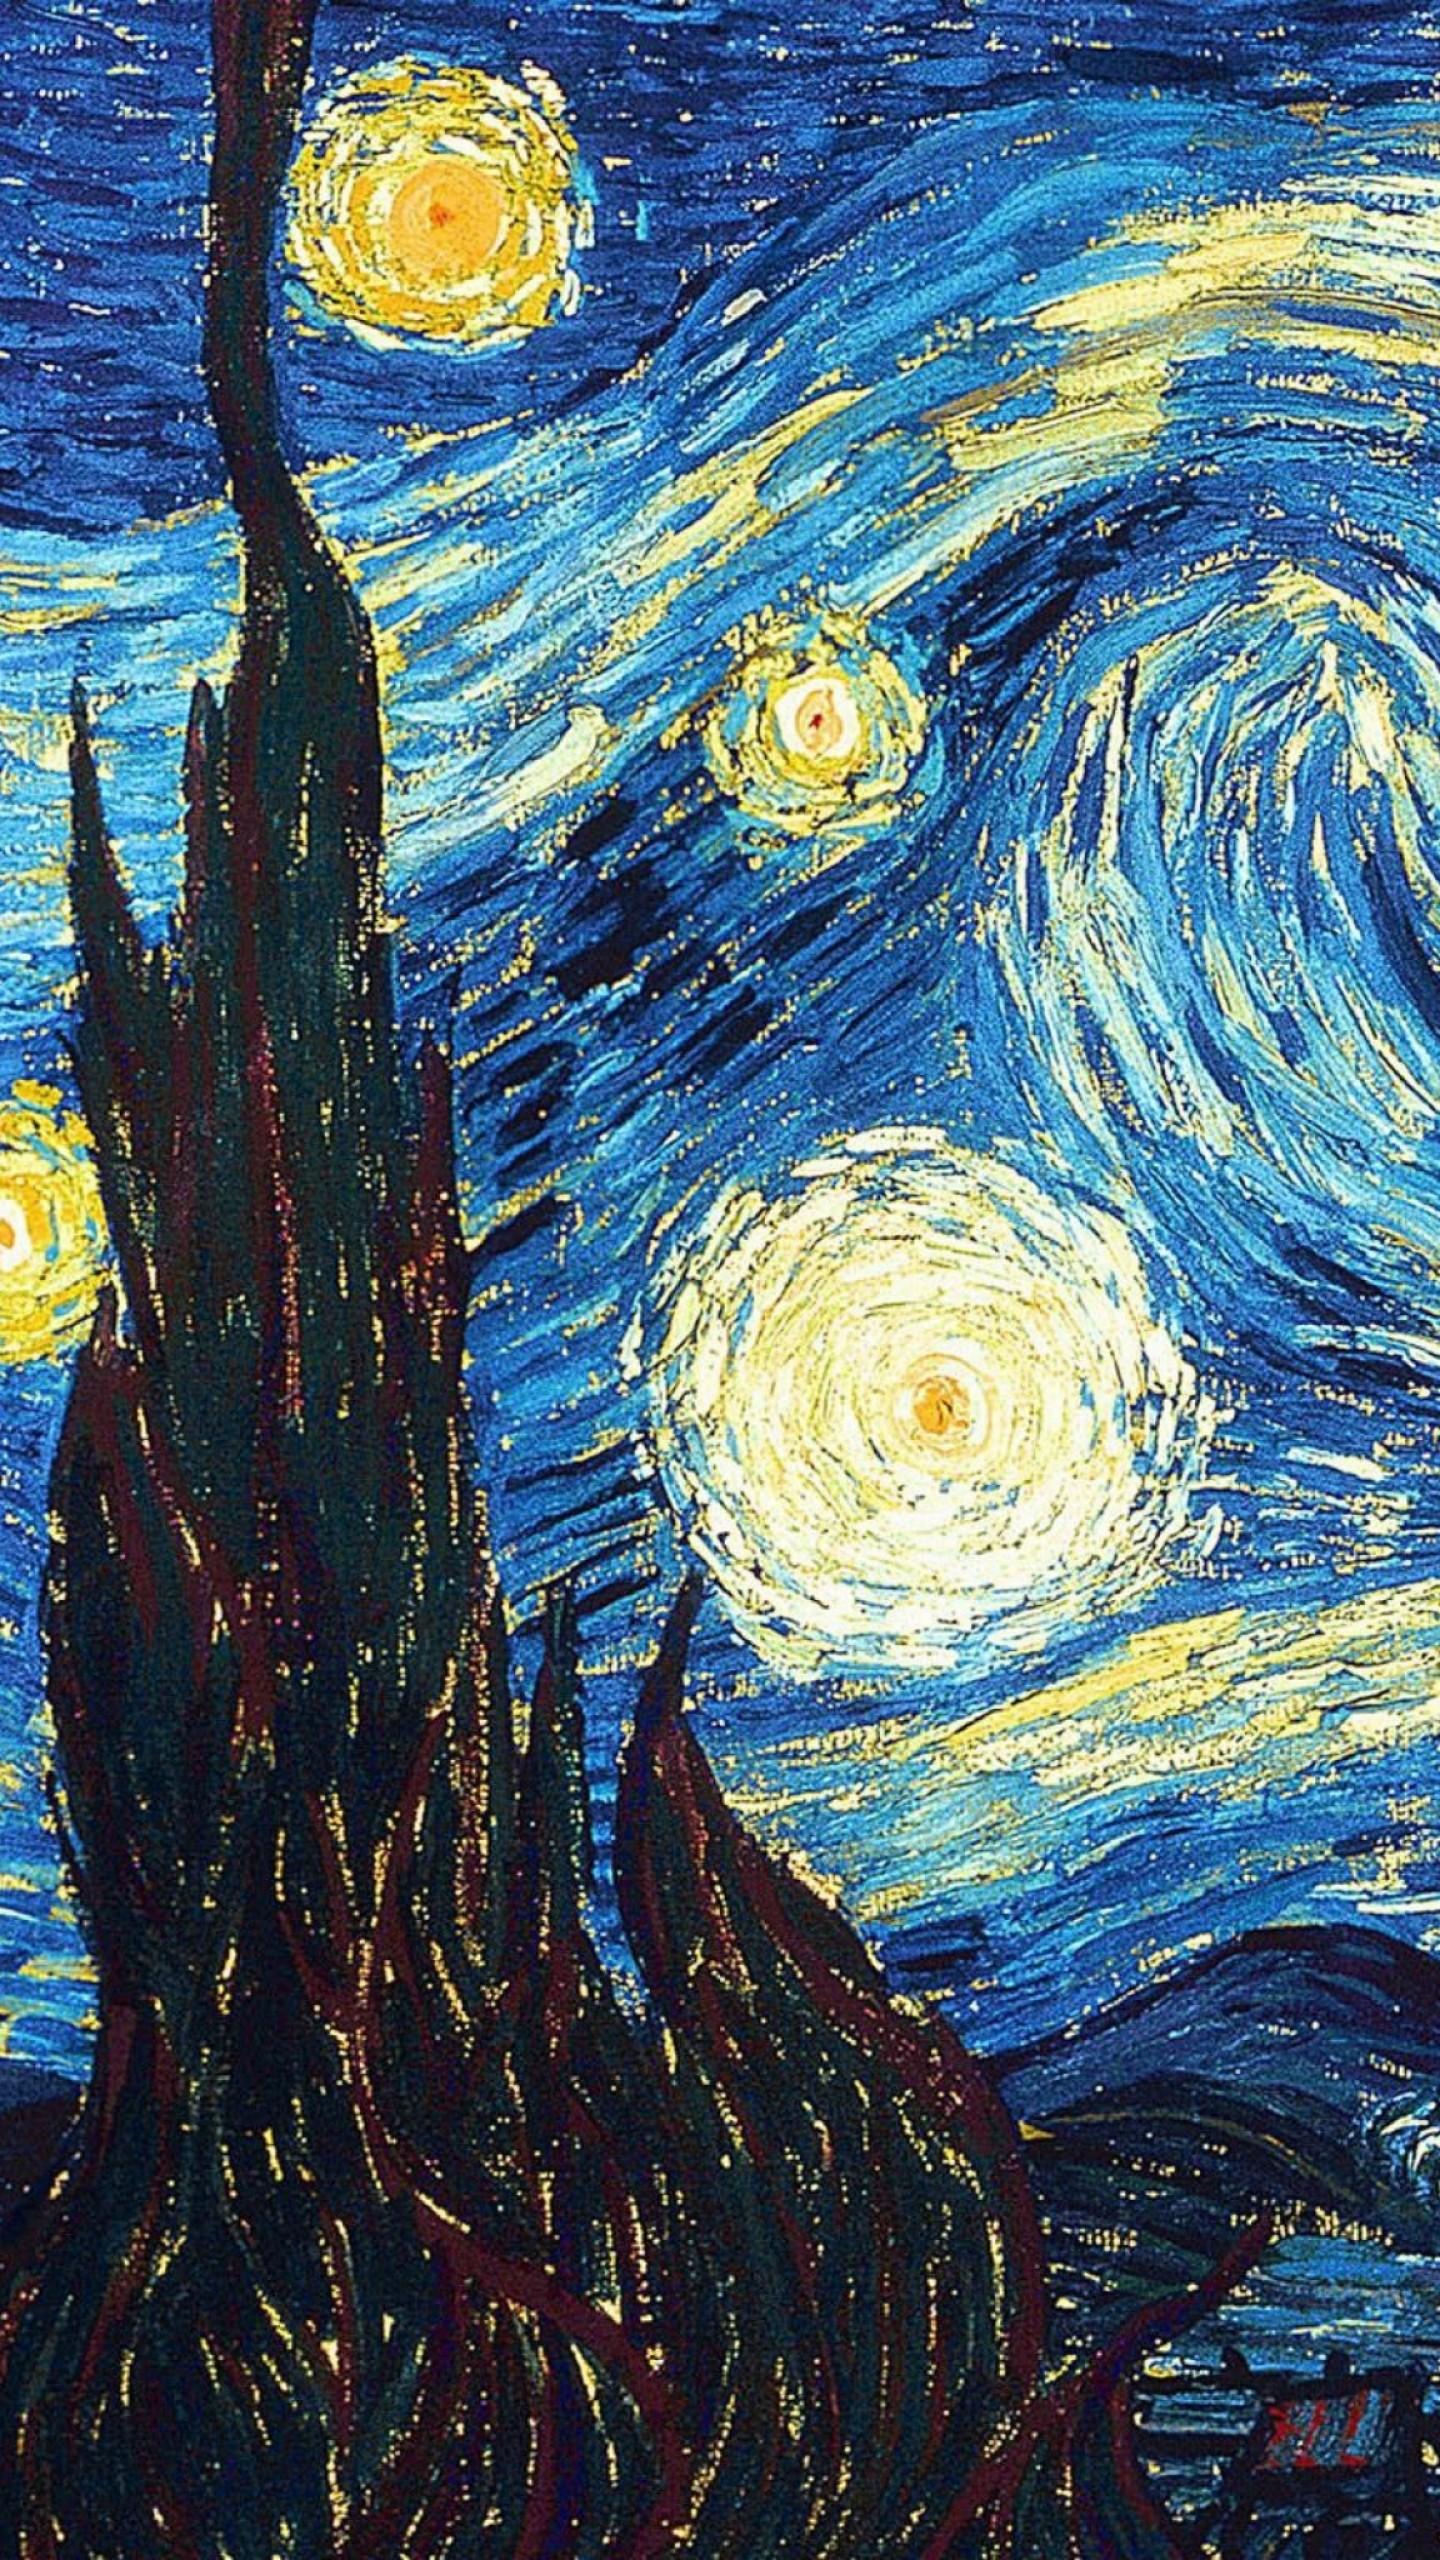 Vincent Van Gogh The Starry Night Wallpaper | 39starry Night 39 ...